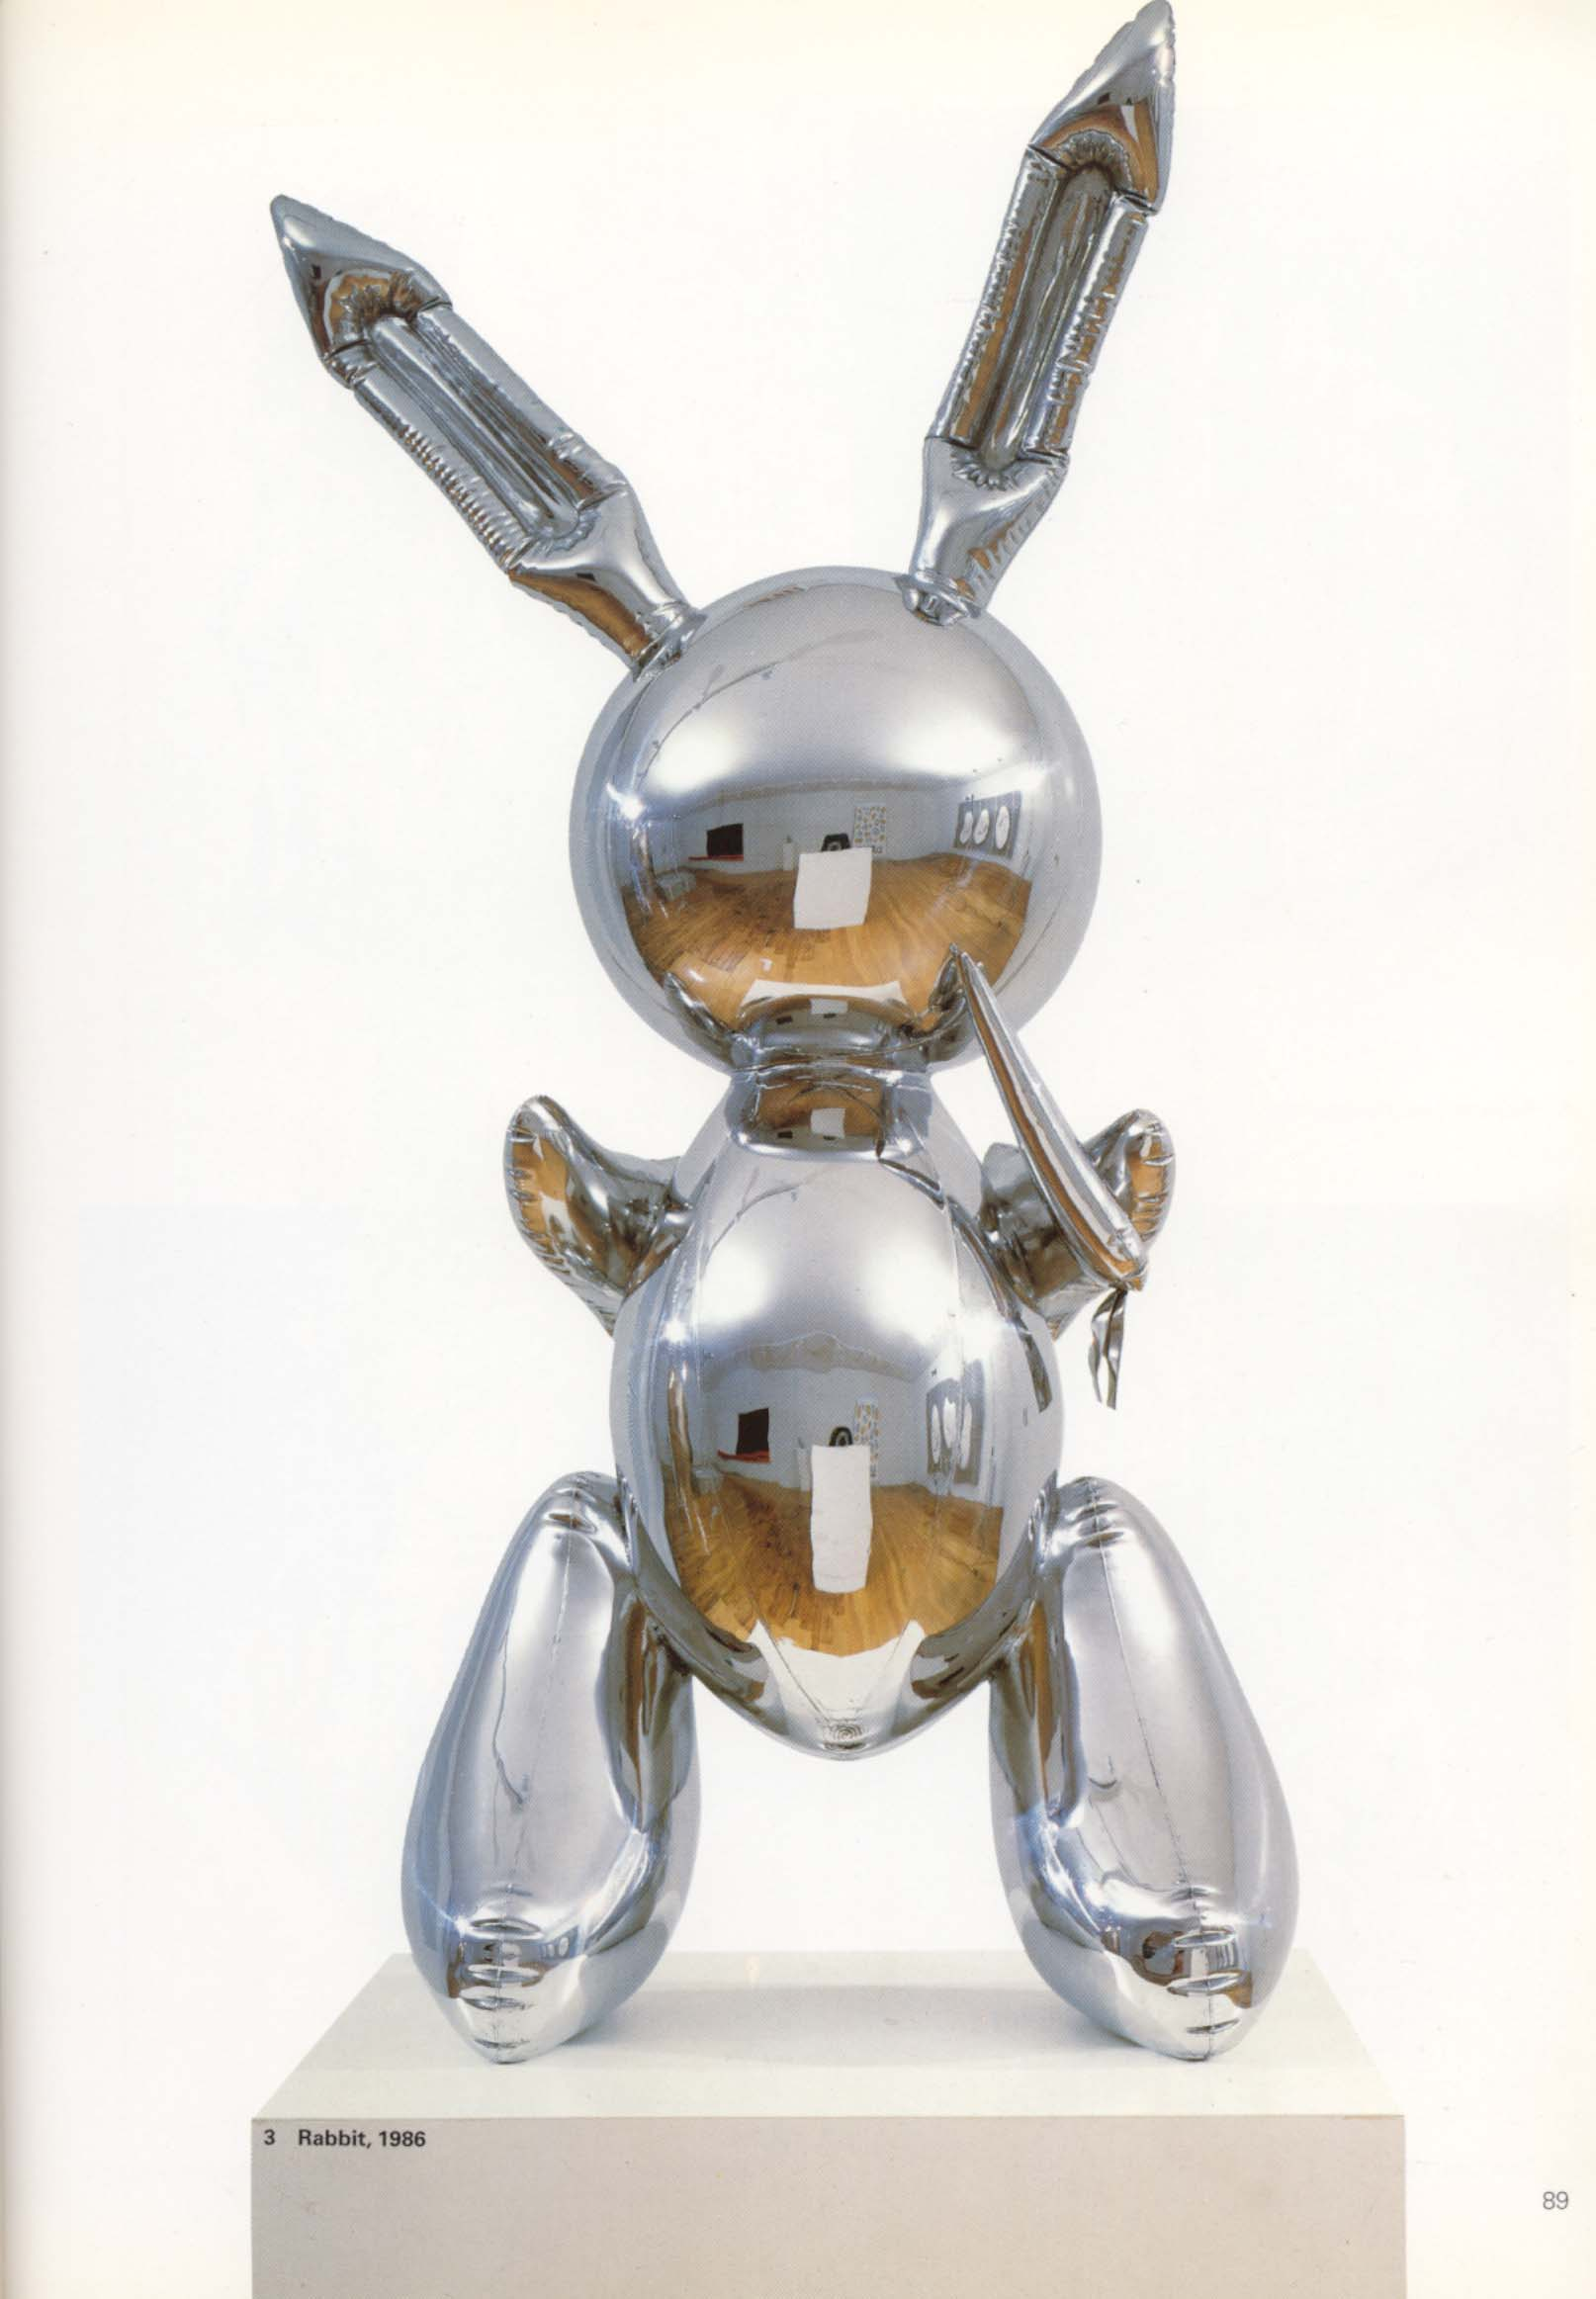 http://toutelaculture.com/wp-content/uploads/2008/09/jeff_koons_rabbit.jpg